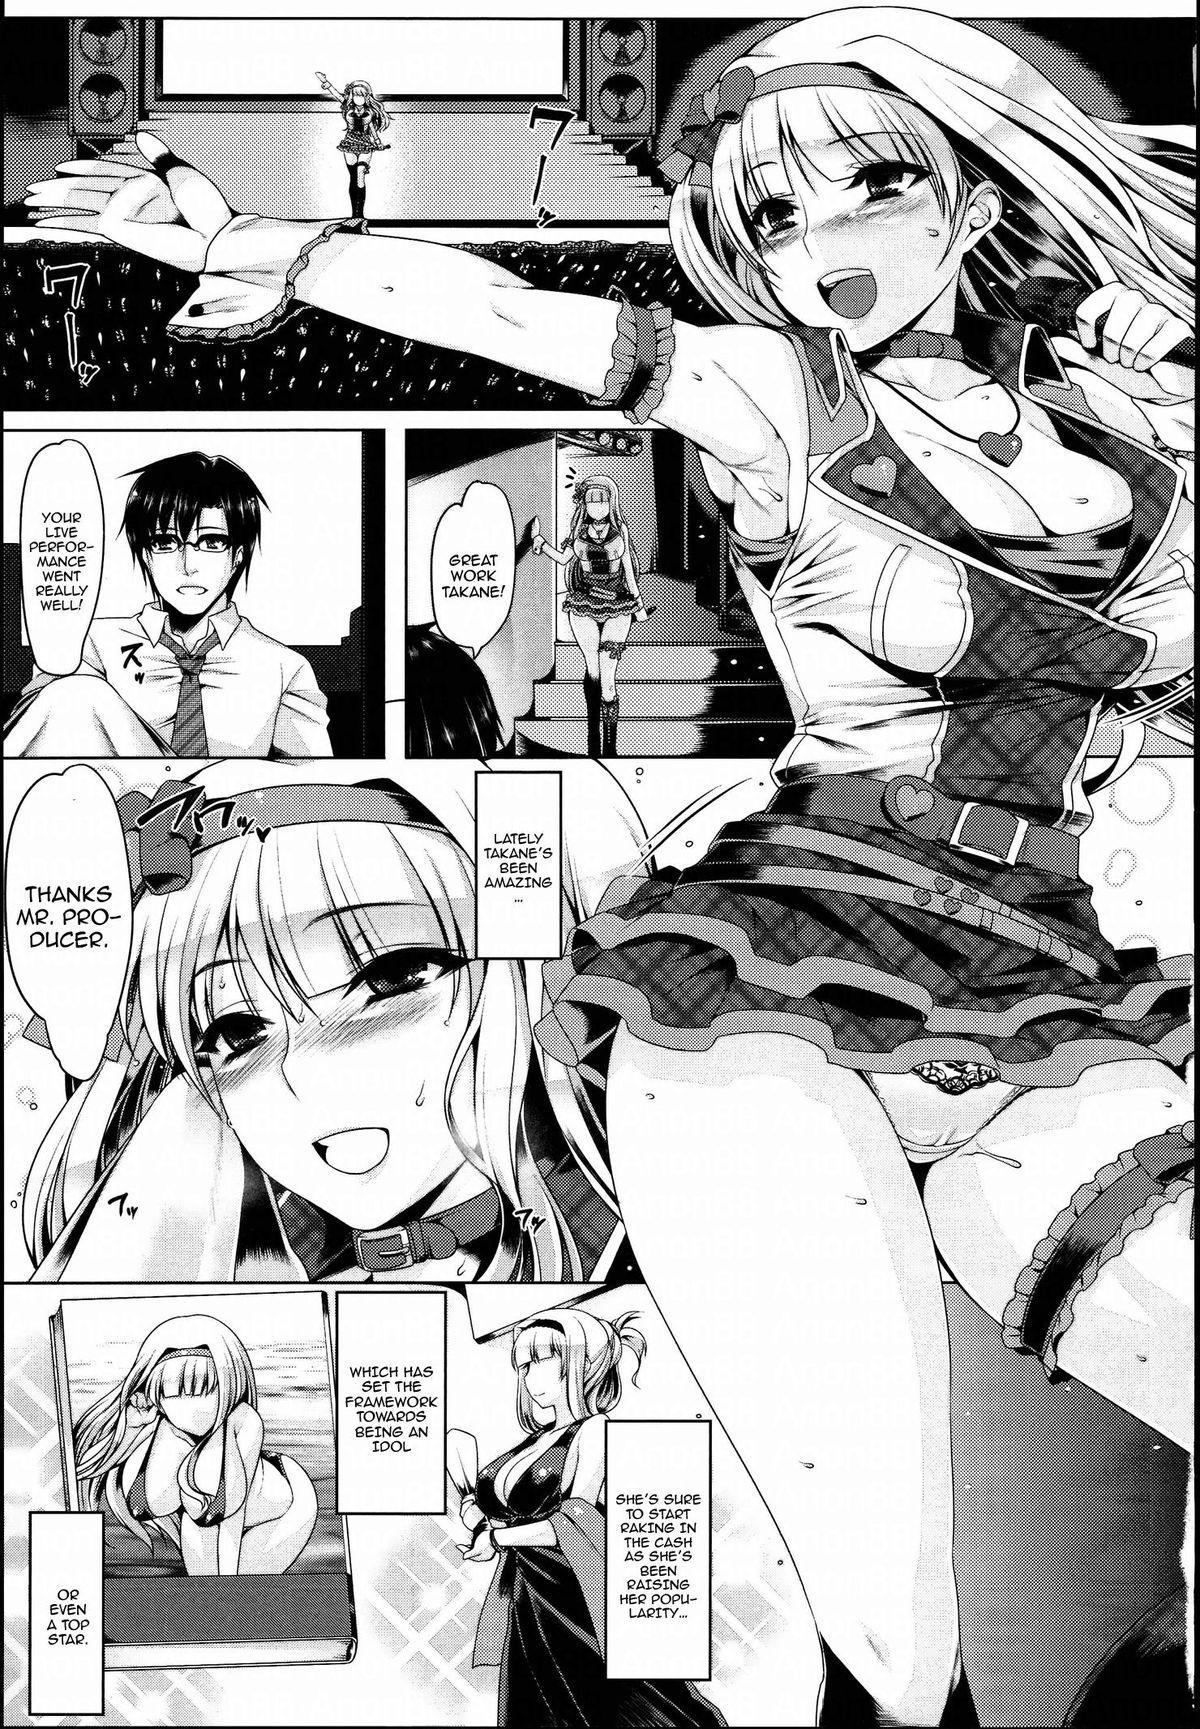 (C86) [Ruiketsuan (Namidame)] Oshiri-Hime no Koufuku   Anal-Princess's Happiness (THE iDOLM@STER) [English] [doujin-moe.us] 1